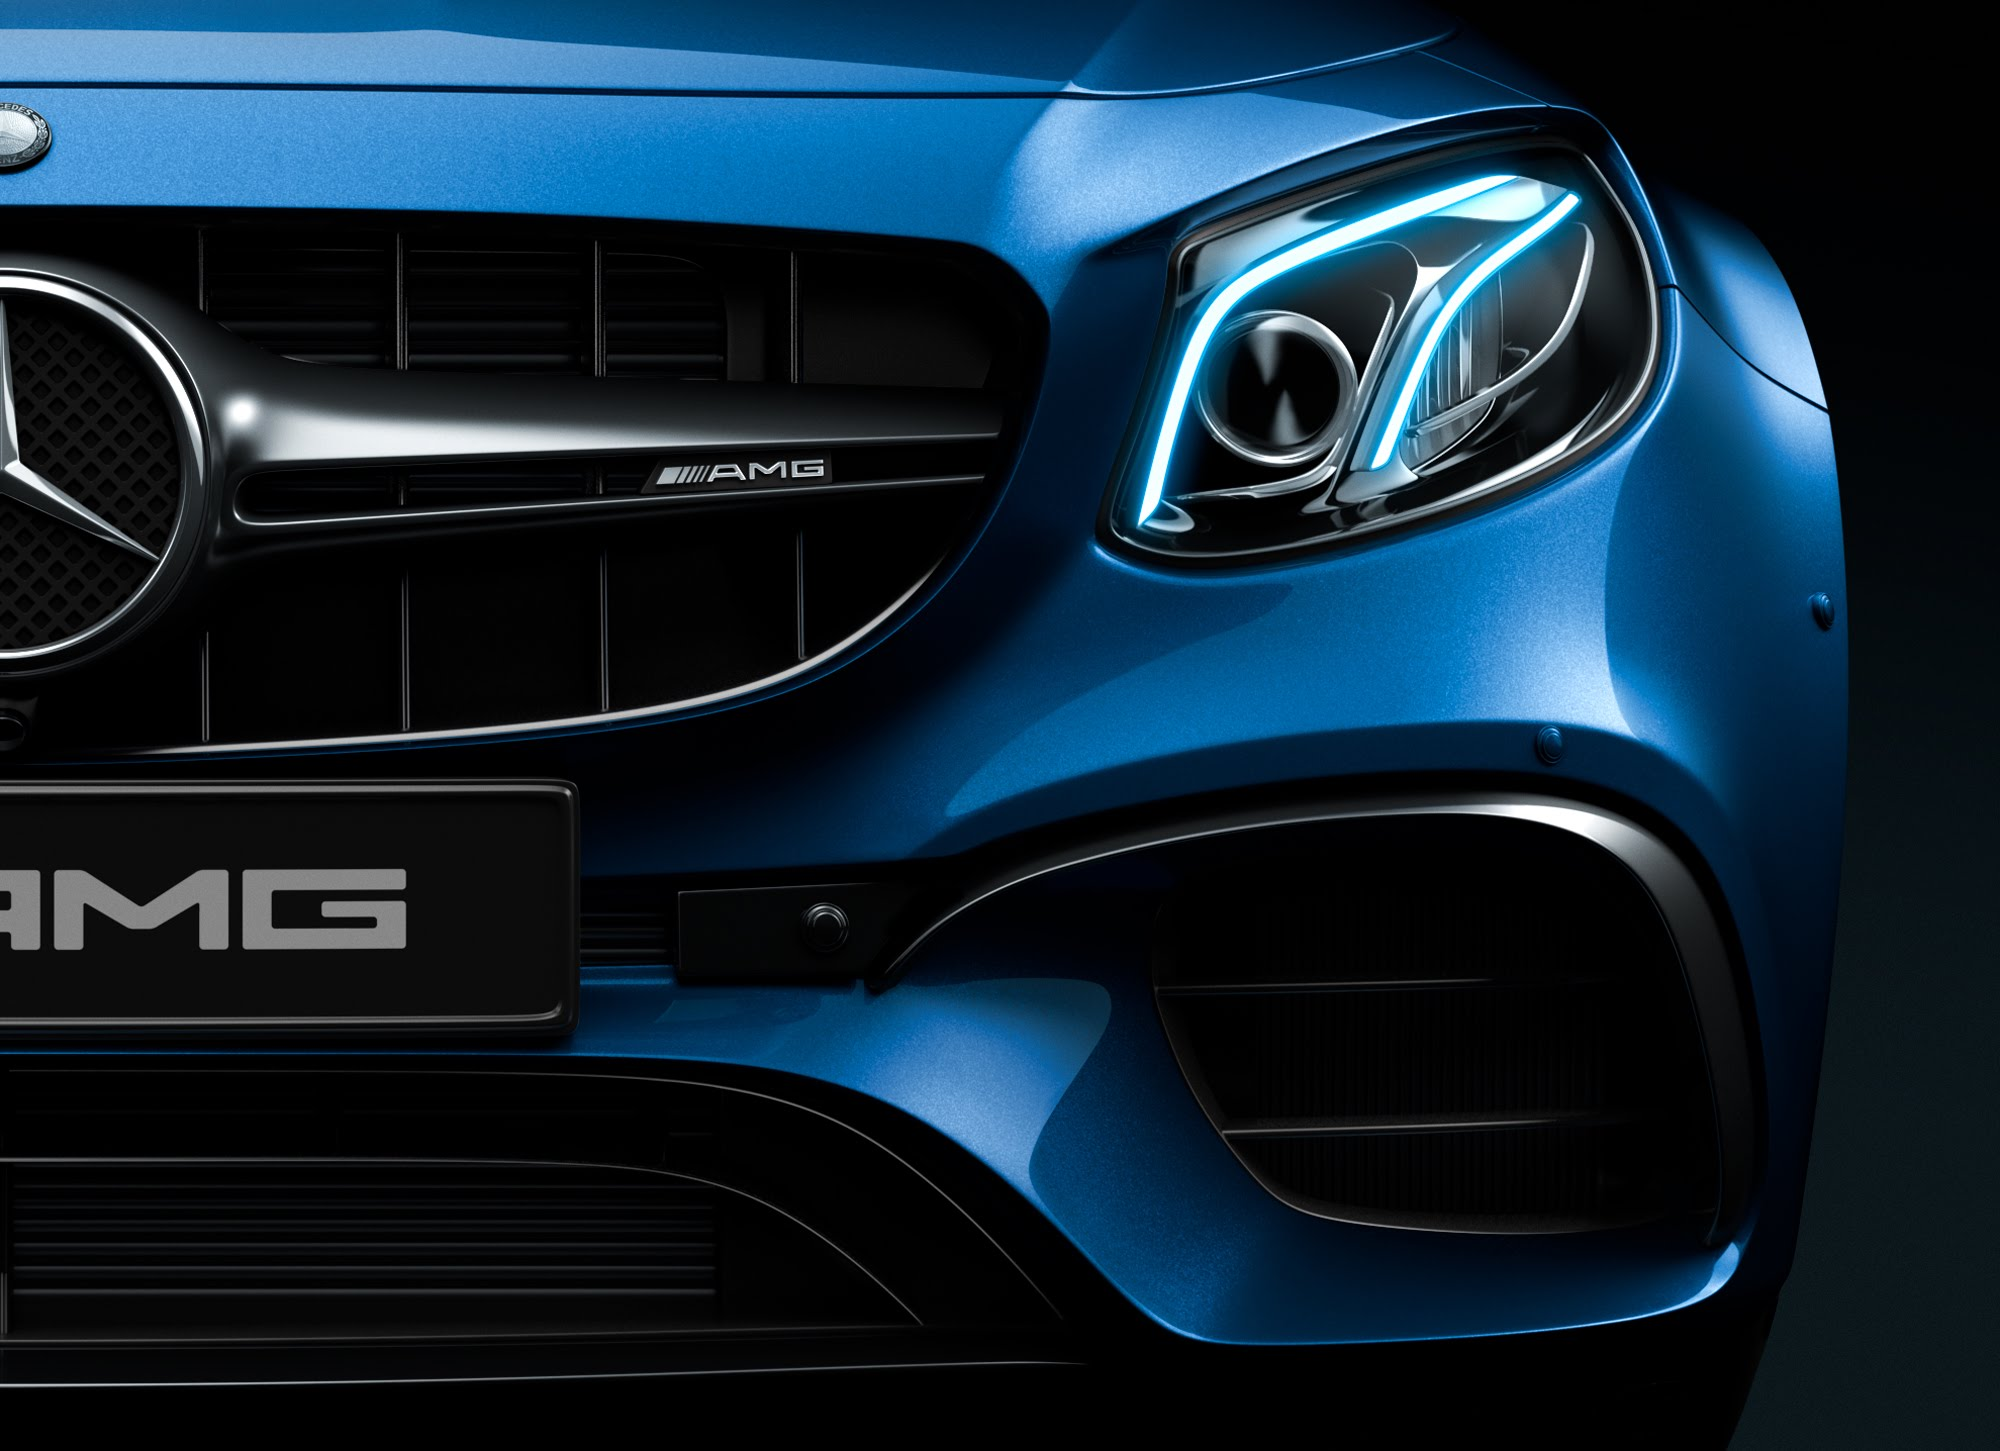 Mercedes_AMG_E63_Studio1_FrontShot_01_03.jpg